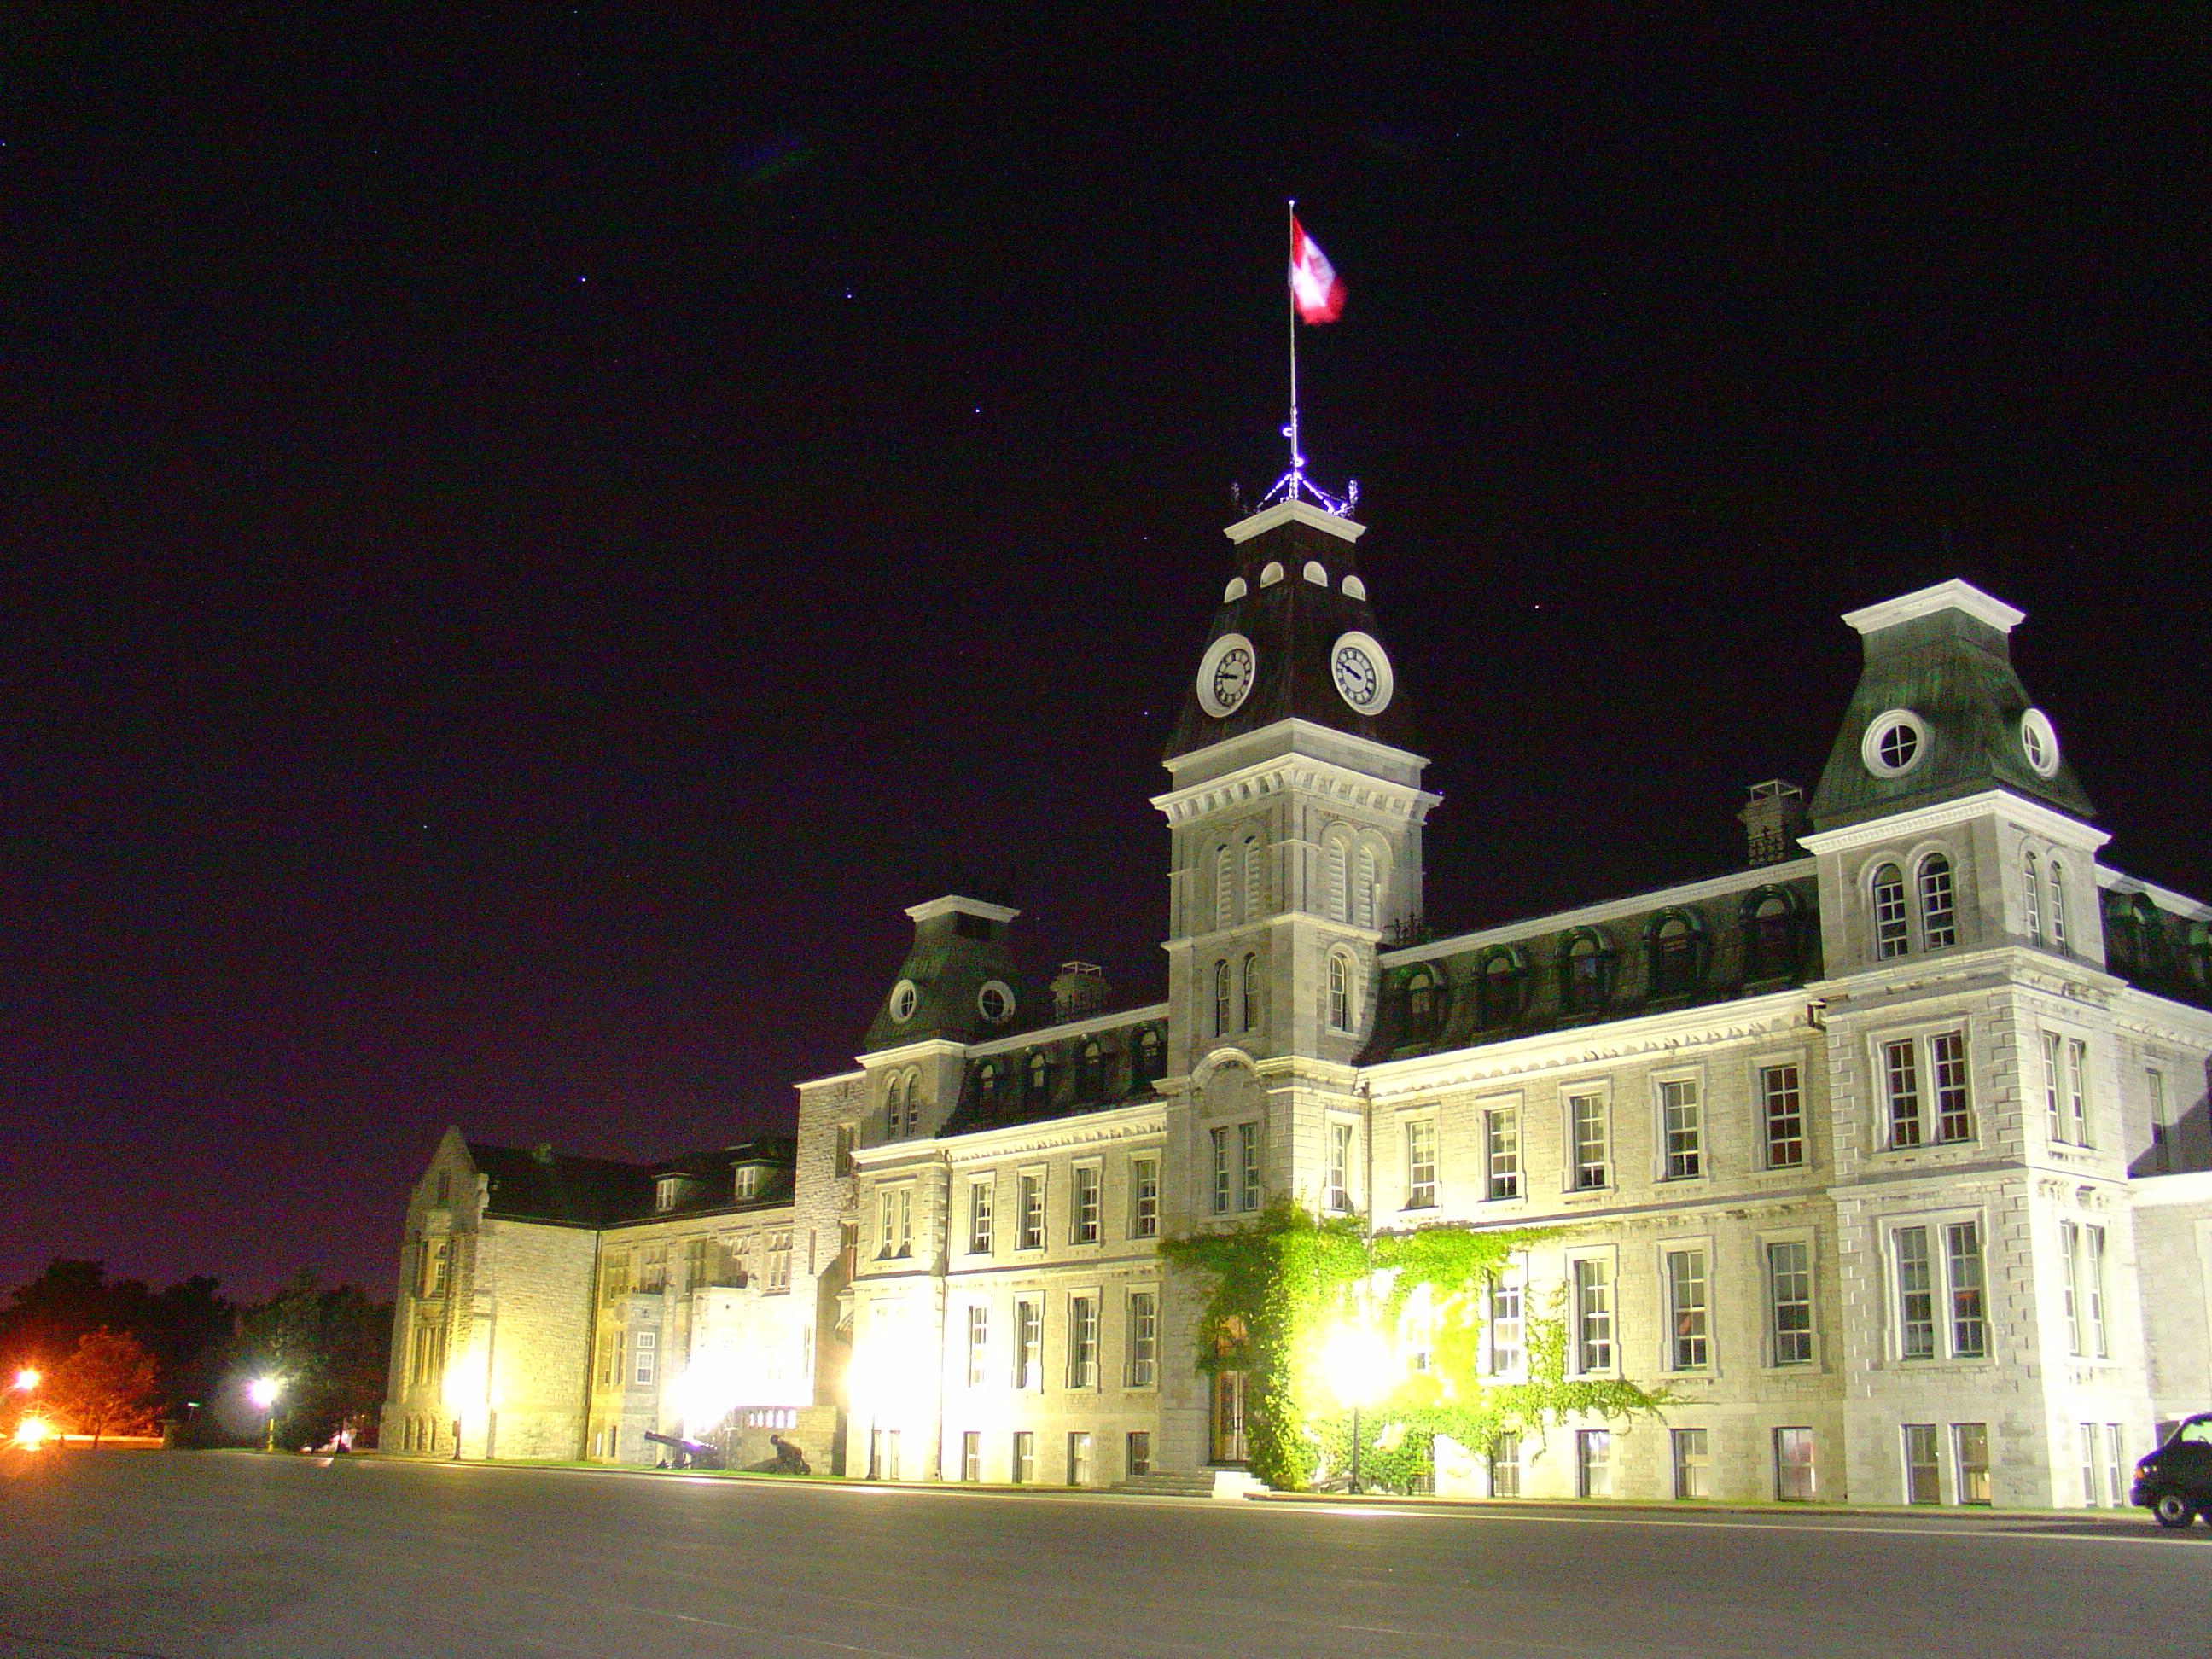 File:RMC Mackenzie building.JPG - Wikipedia, the free encyclopedia